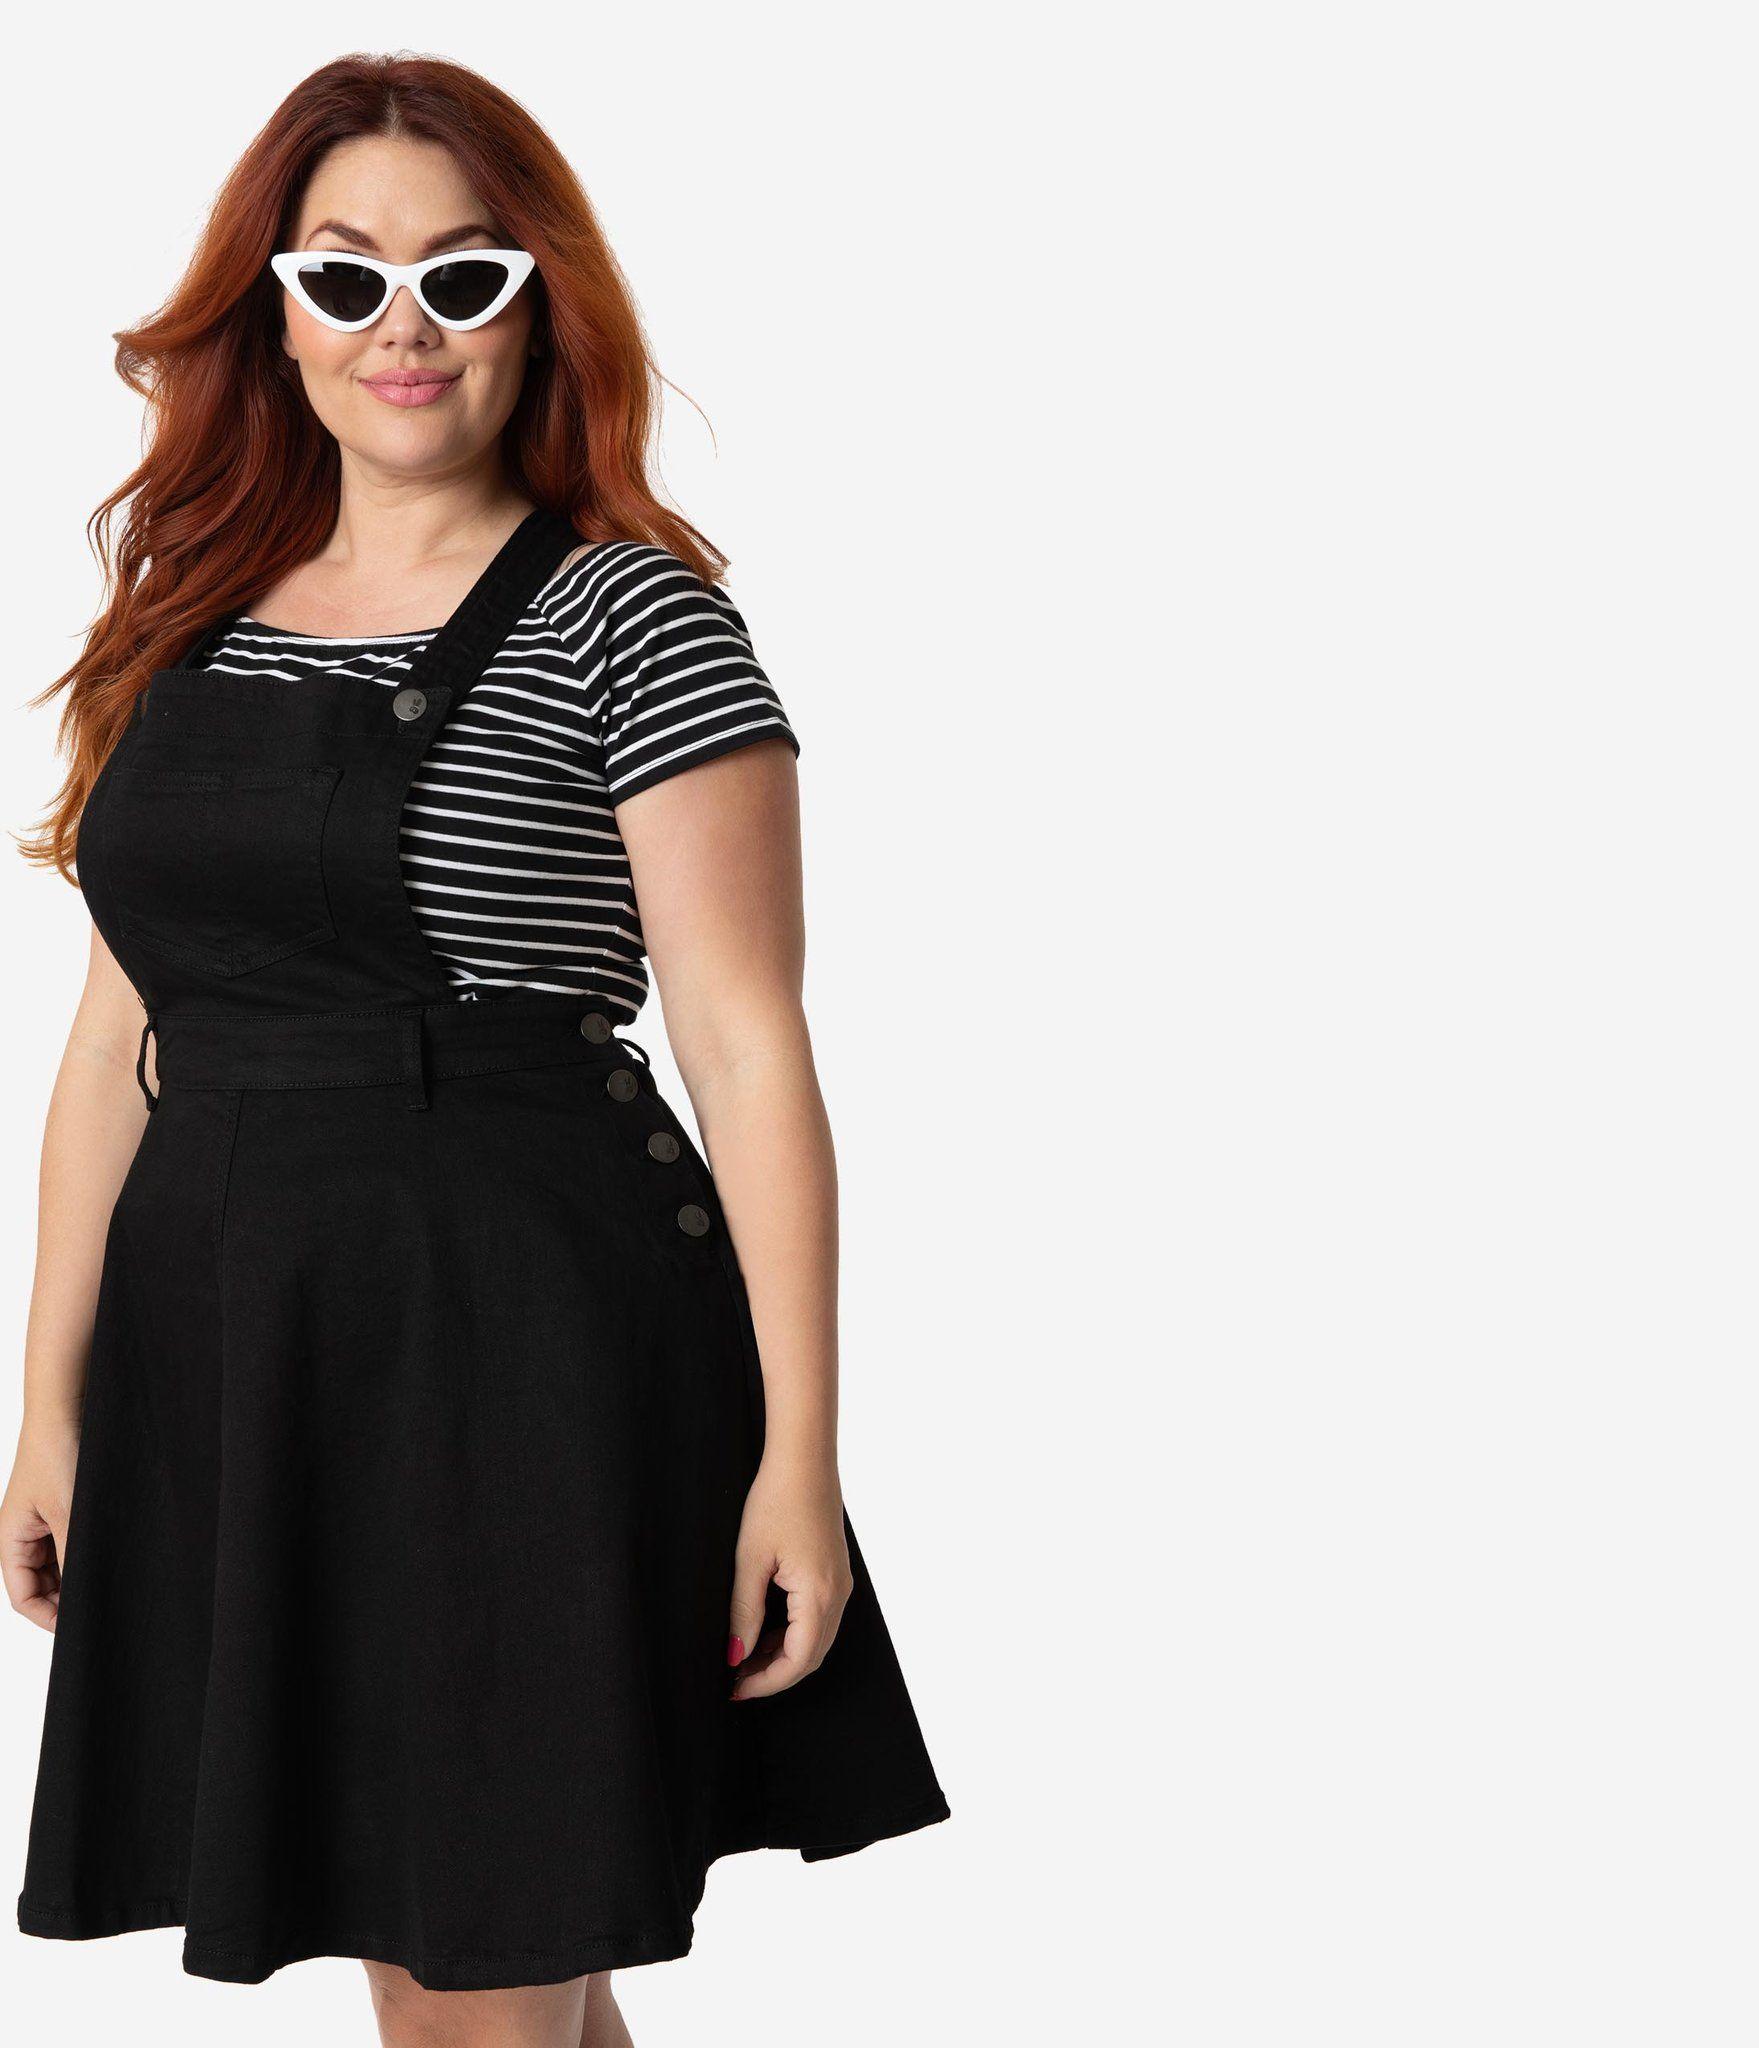 c6d887ccb77621 Hell Bunny Plus Size Black Cotton Denim Stretch Dakota Overall Skirt –  Unique Vintage